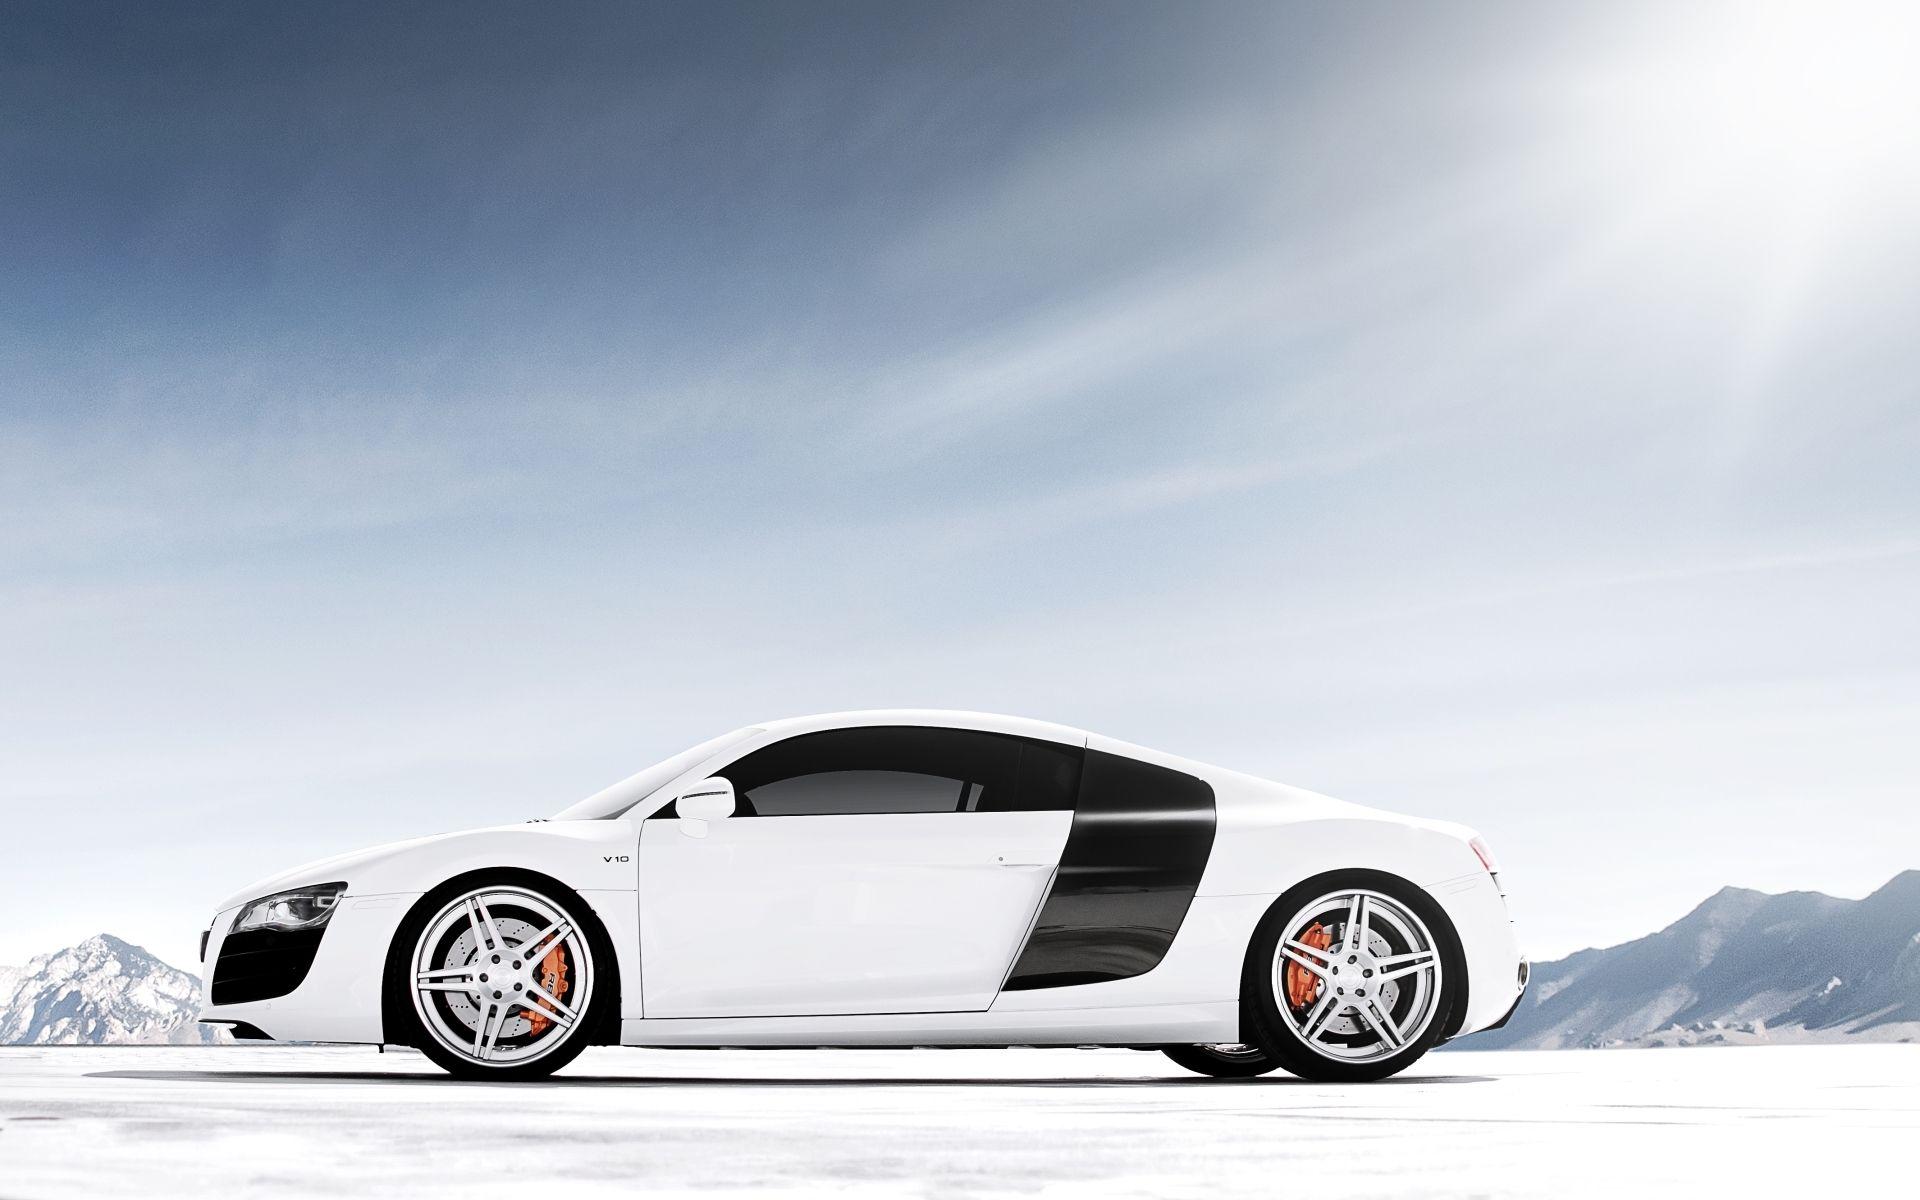 Audi R8 V10 Wallpaper Free High Quality Car Wallpapers Hd 1080p